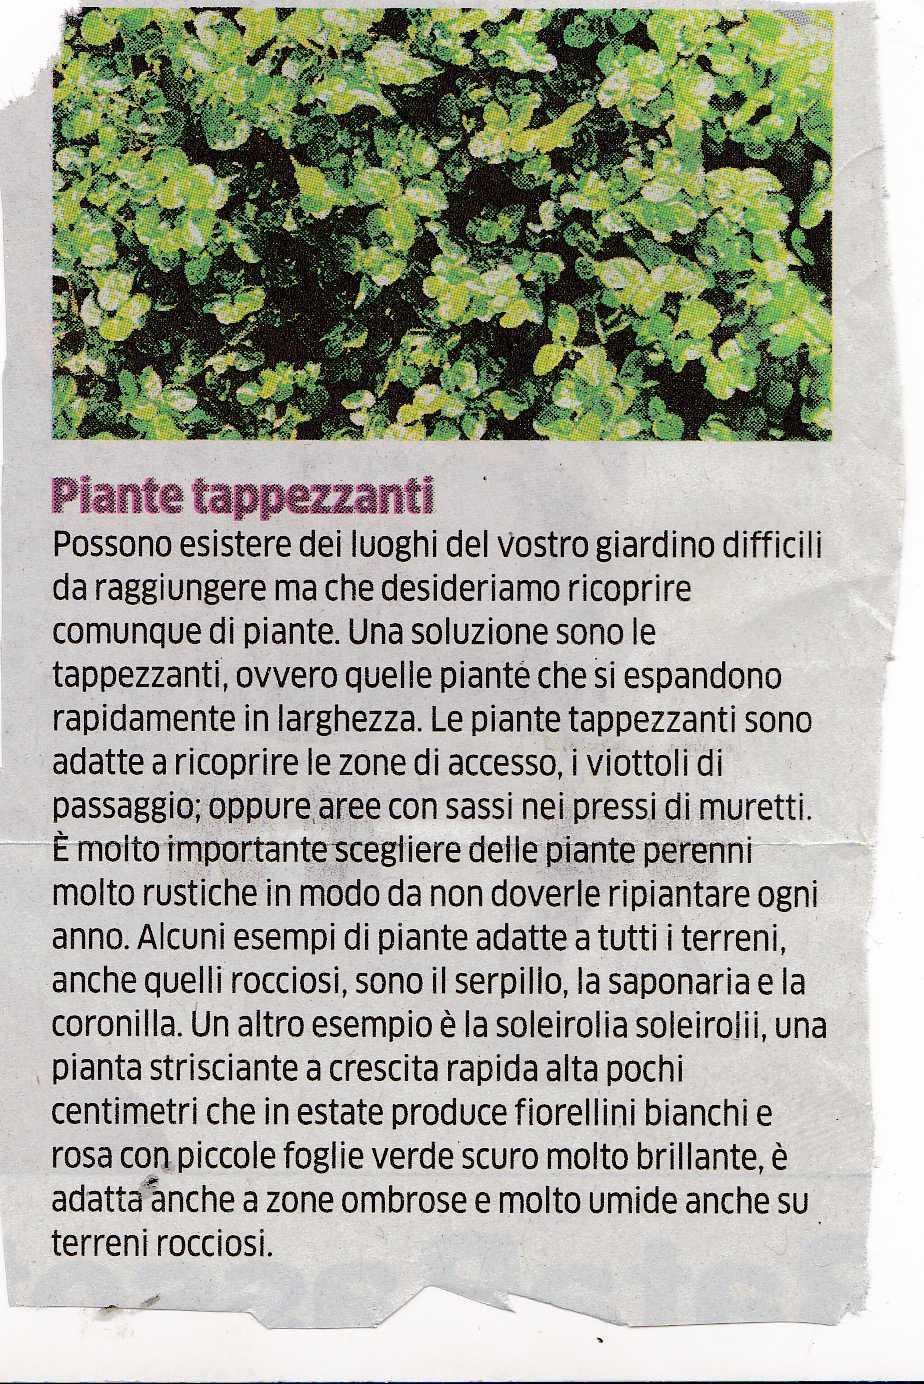 piante tsappezzanti3457